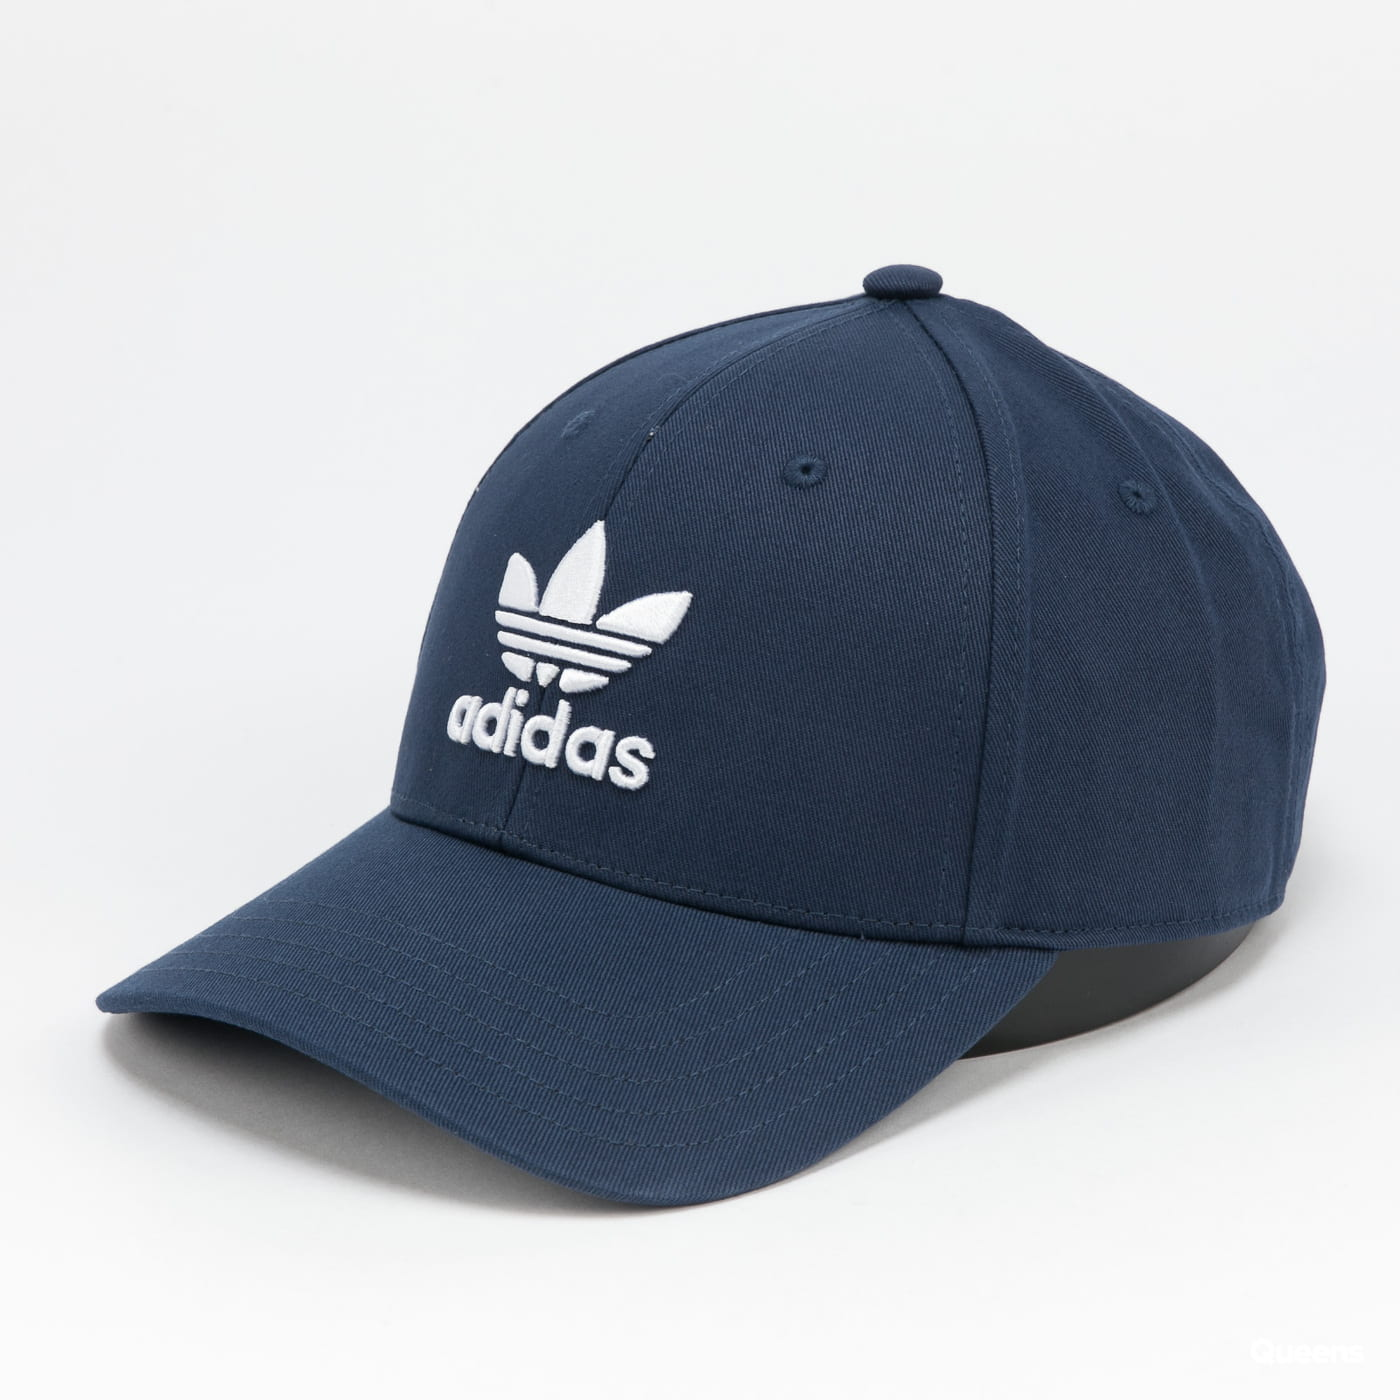 adidas Originals Baseball Classic Trefoil Cap navy